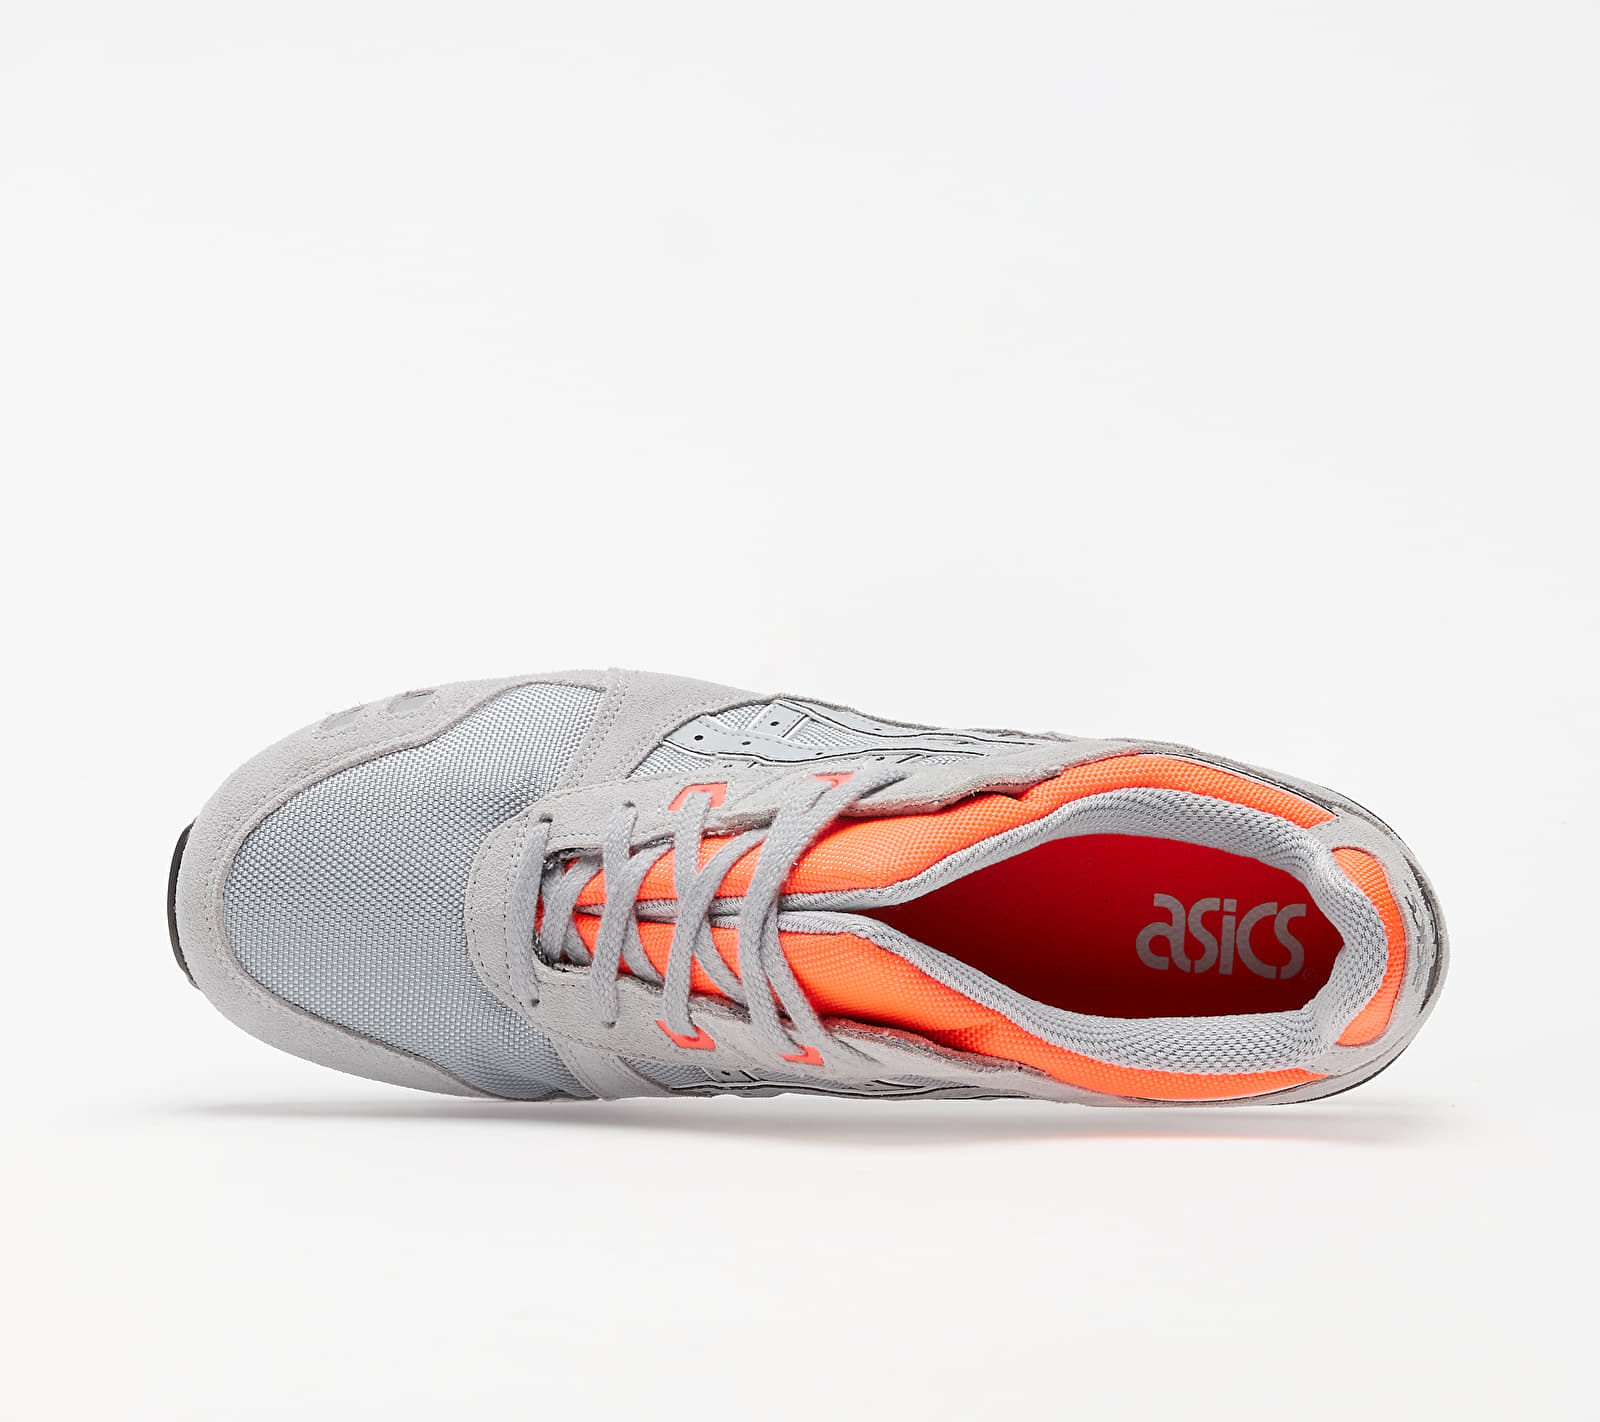 Asics Gel Lyte III OG Piedmont Grey/ Piedmont Grey, Gray